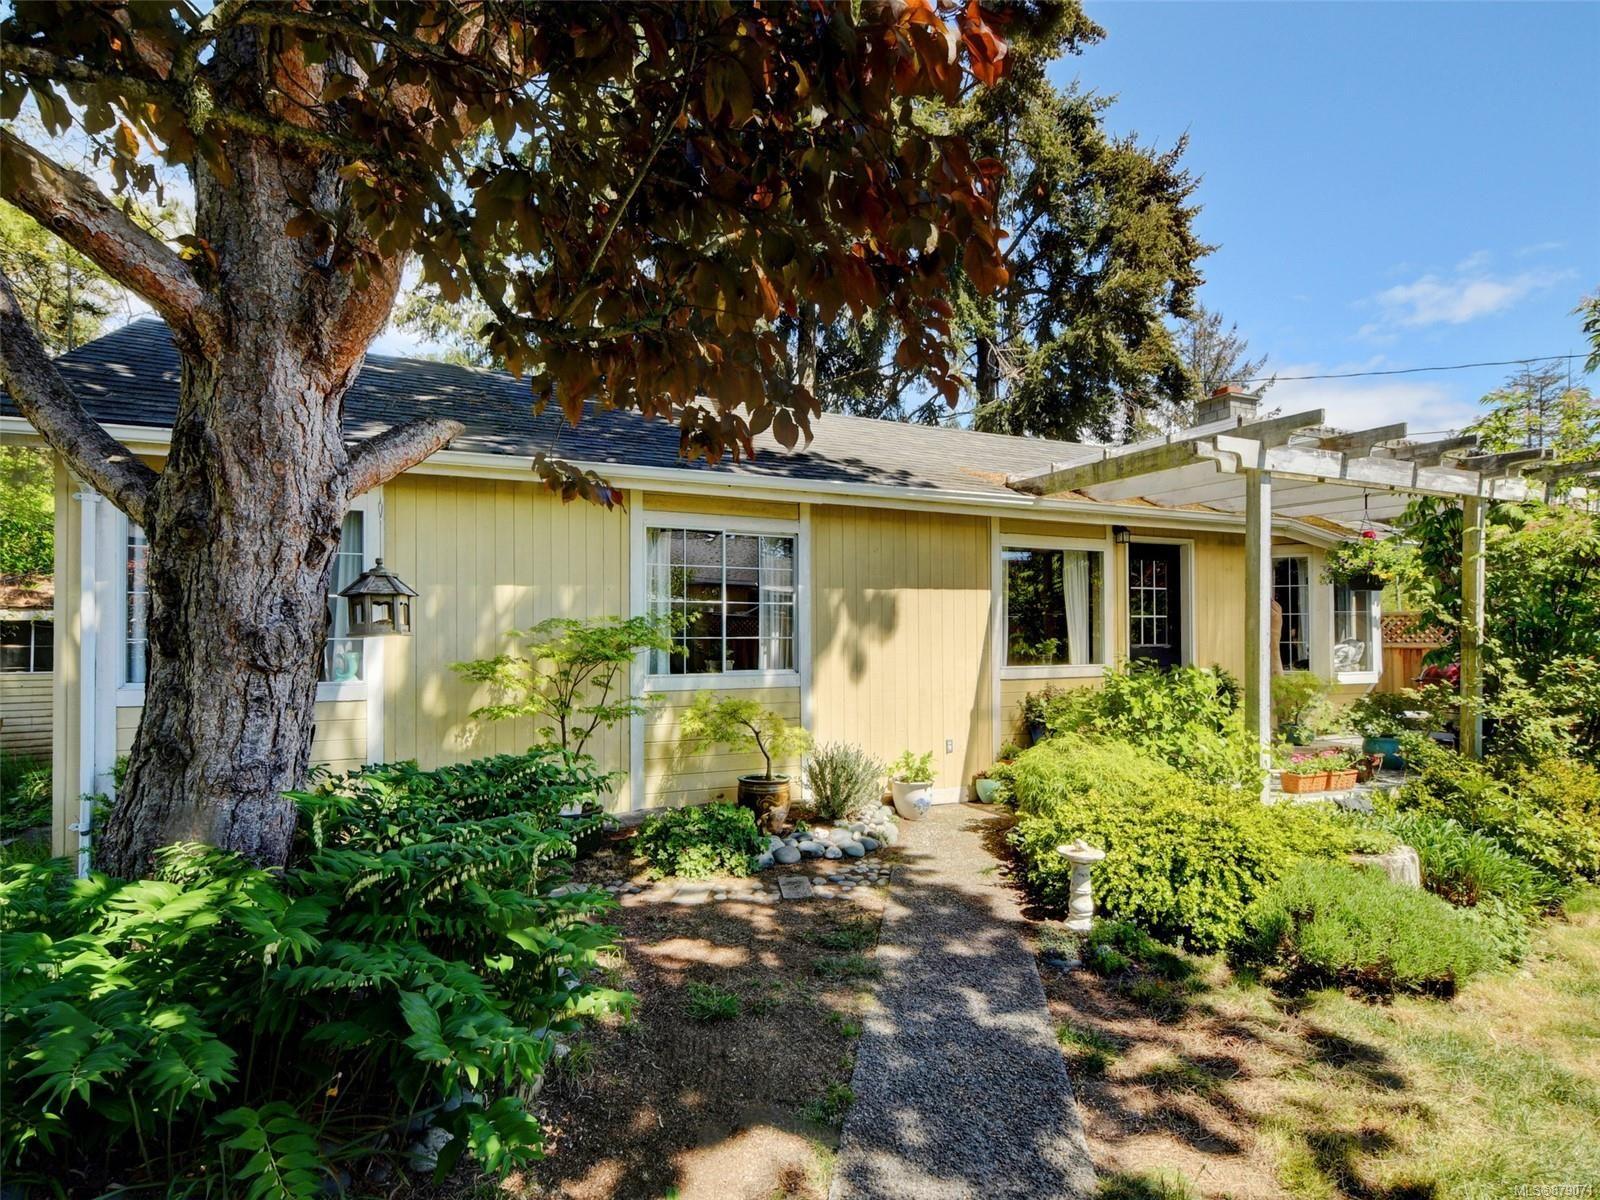 Main Photo: C 7885 West Coast Rd in : Sk Kemp Lake House for sale (Sooke)  : MLS®# 879071